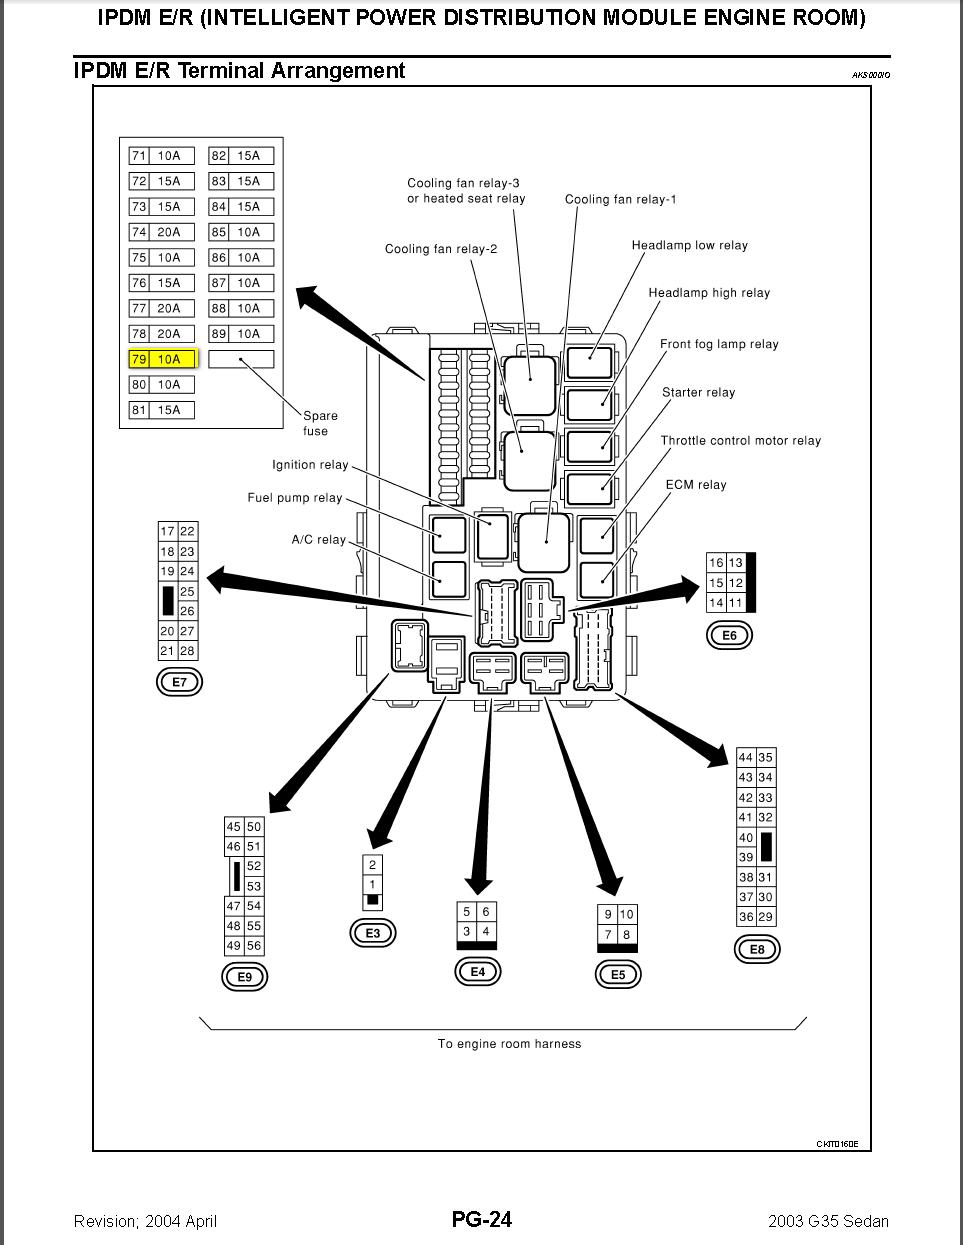 350z 2006 Fuse Box Diagram - Wiring Diagram Sourcesavemoney.gg